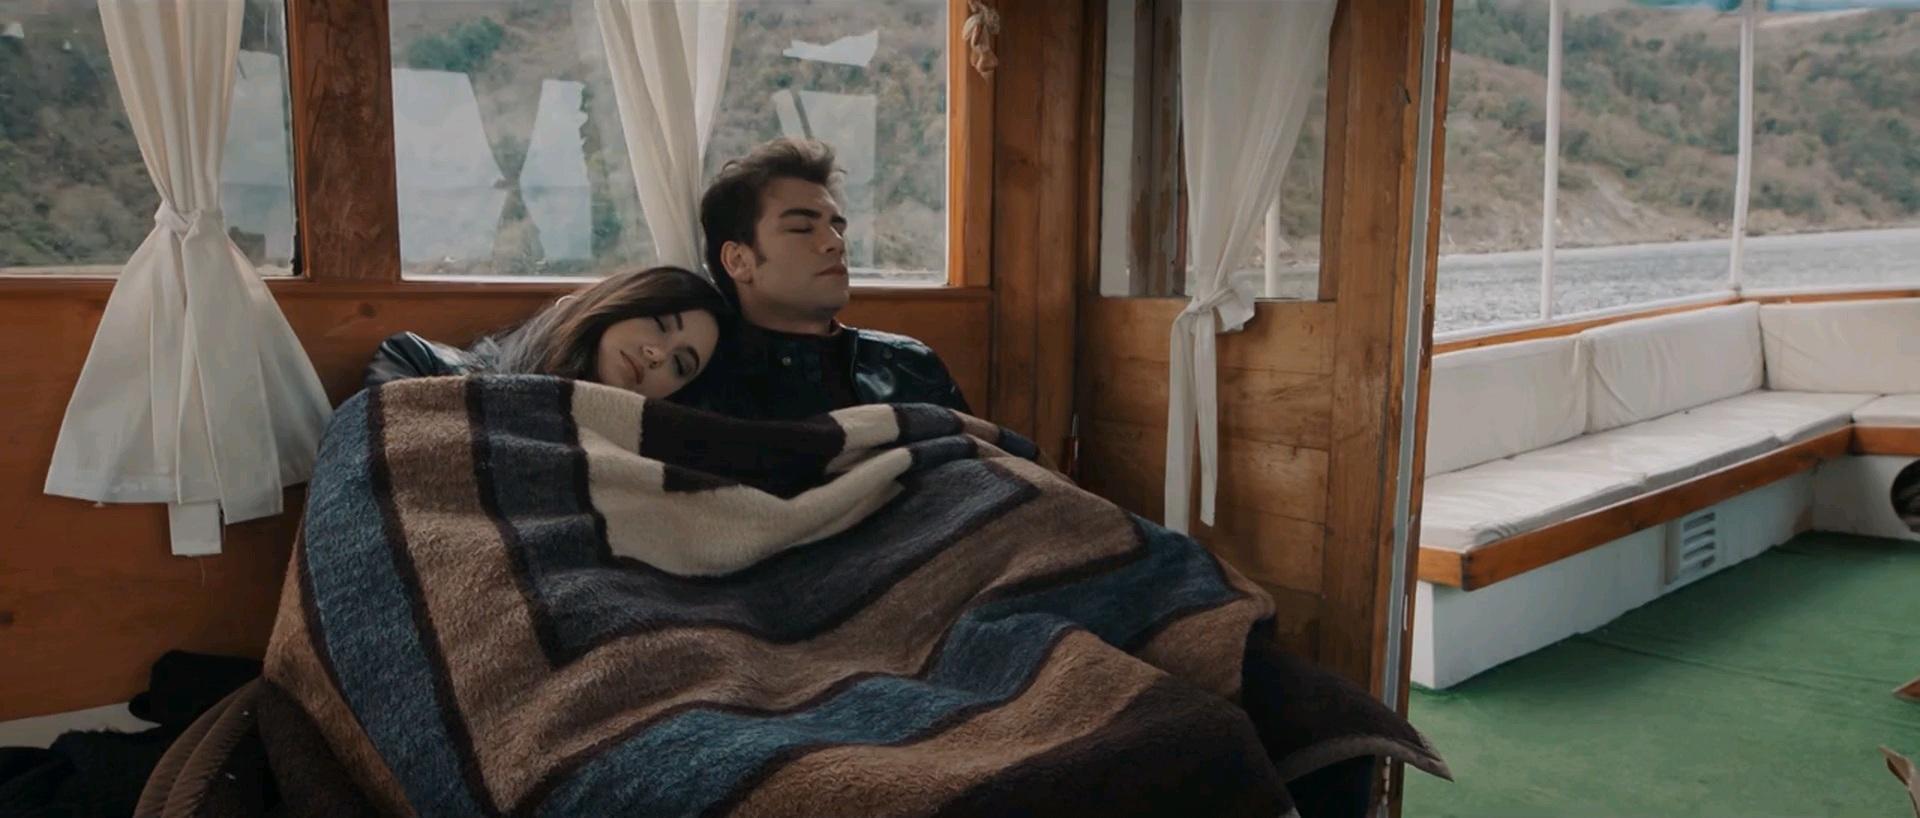 Ali | 2019 | Yerli Film | WEB-DL | XviD | Sansürsüz | m720p - m1080p | WEB-DL | Tek Link